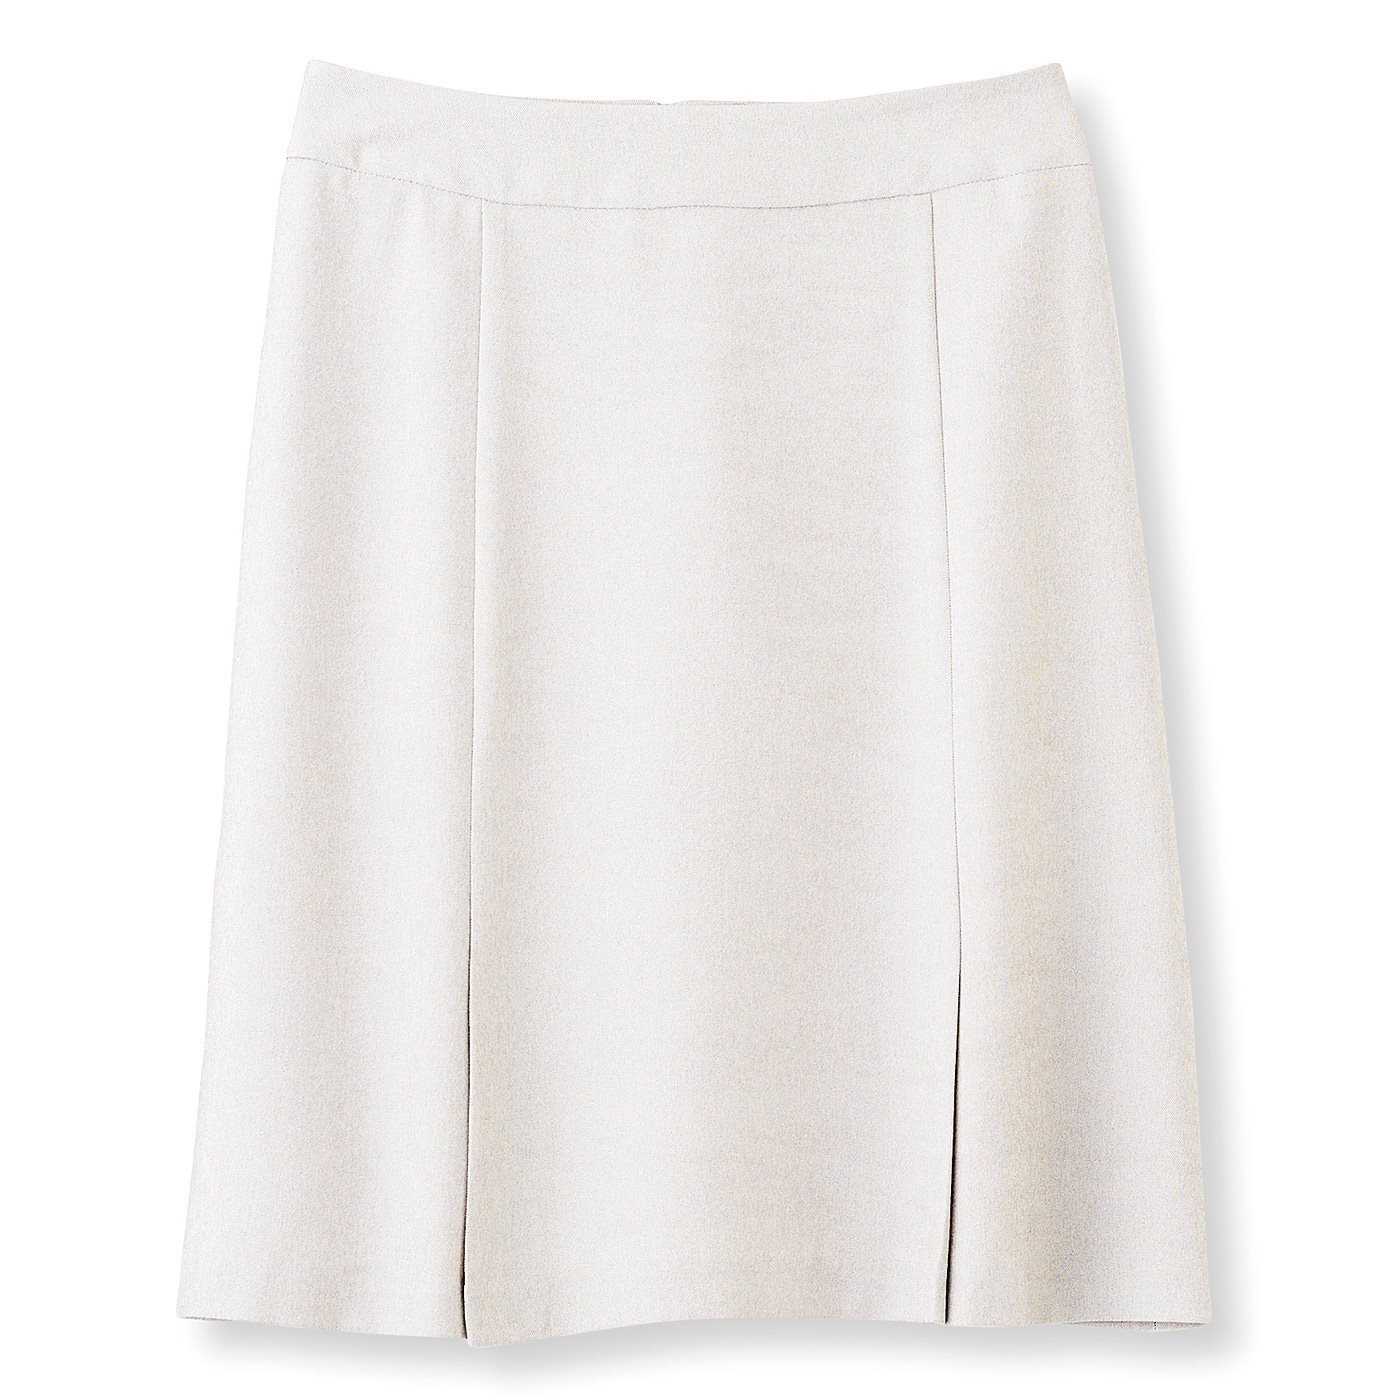 DRECOバイヤーズセレクト ドライシャーク素材の吸汗速乾ストレッチIラインスカート〈グレー〉